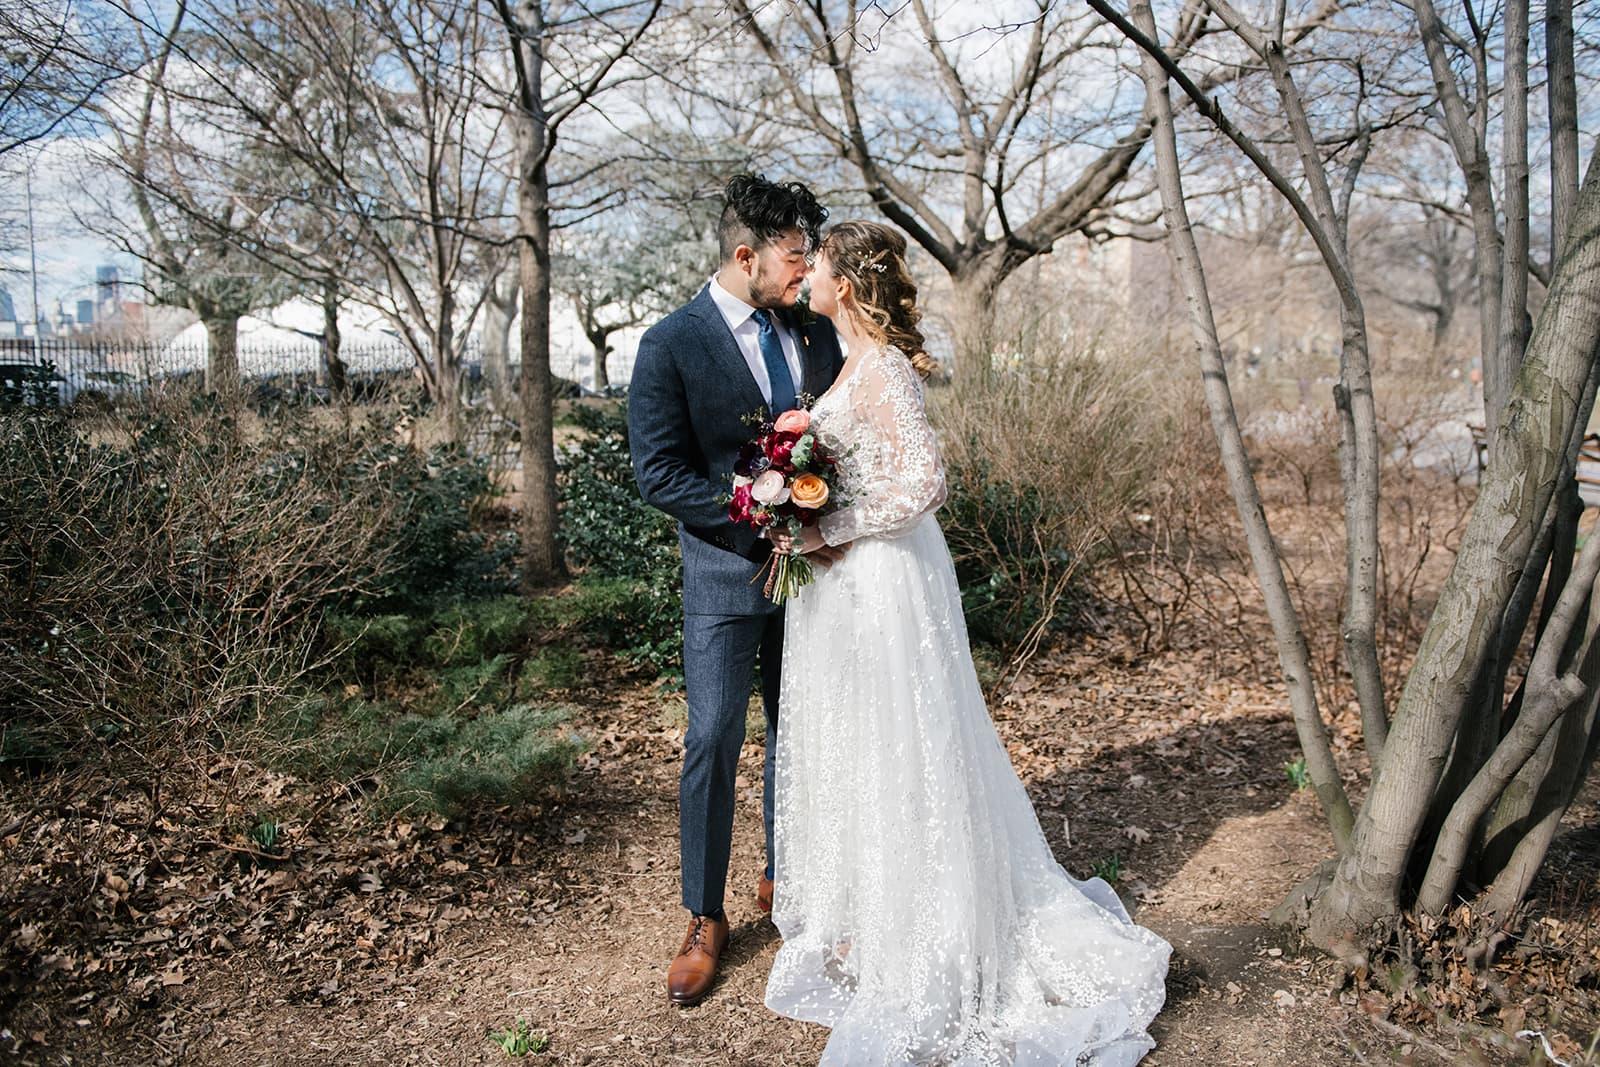 Wedding photos in McCarran Park in Williamsburg, Brooklyn. Photos by Brooklyn wedding photographer Everly Studios, www.everlystudios.com